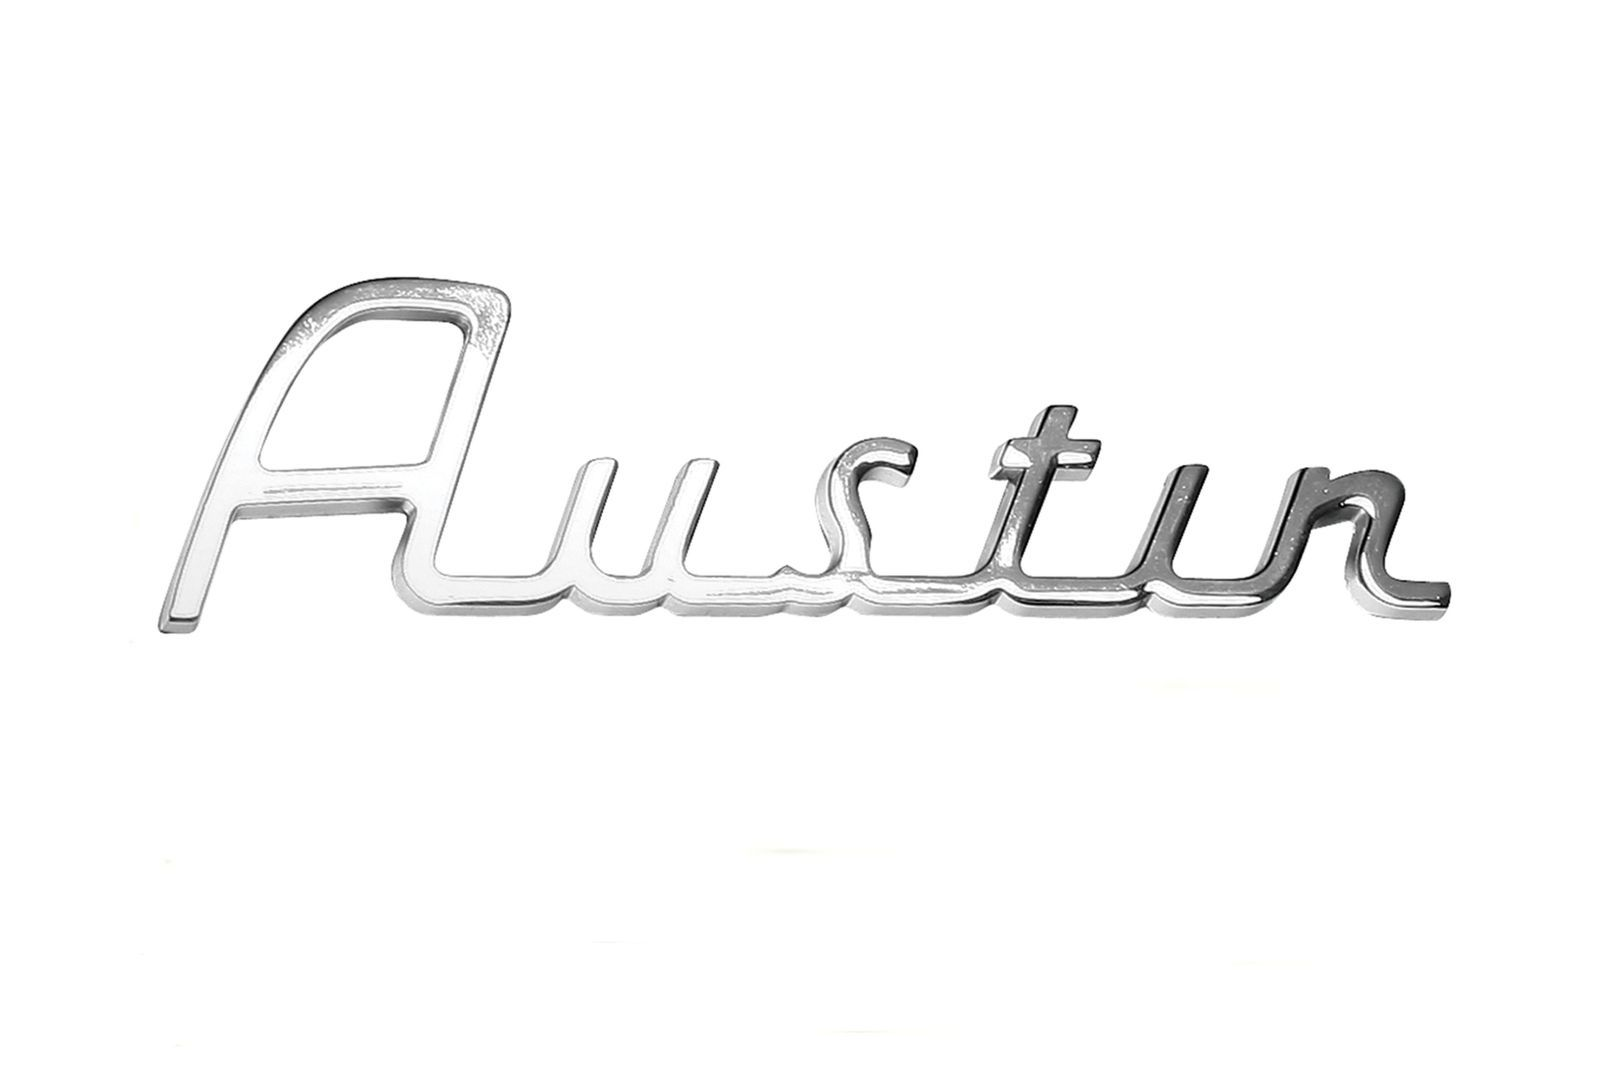 "#Abzeichen ""Austin"" Schriftzug Kofferraumdeckel Mini, 14A 6802"